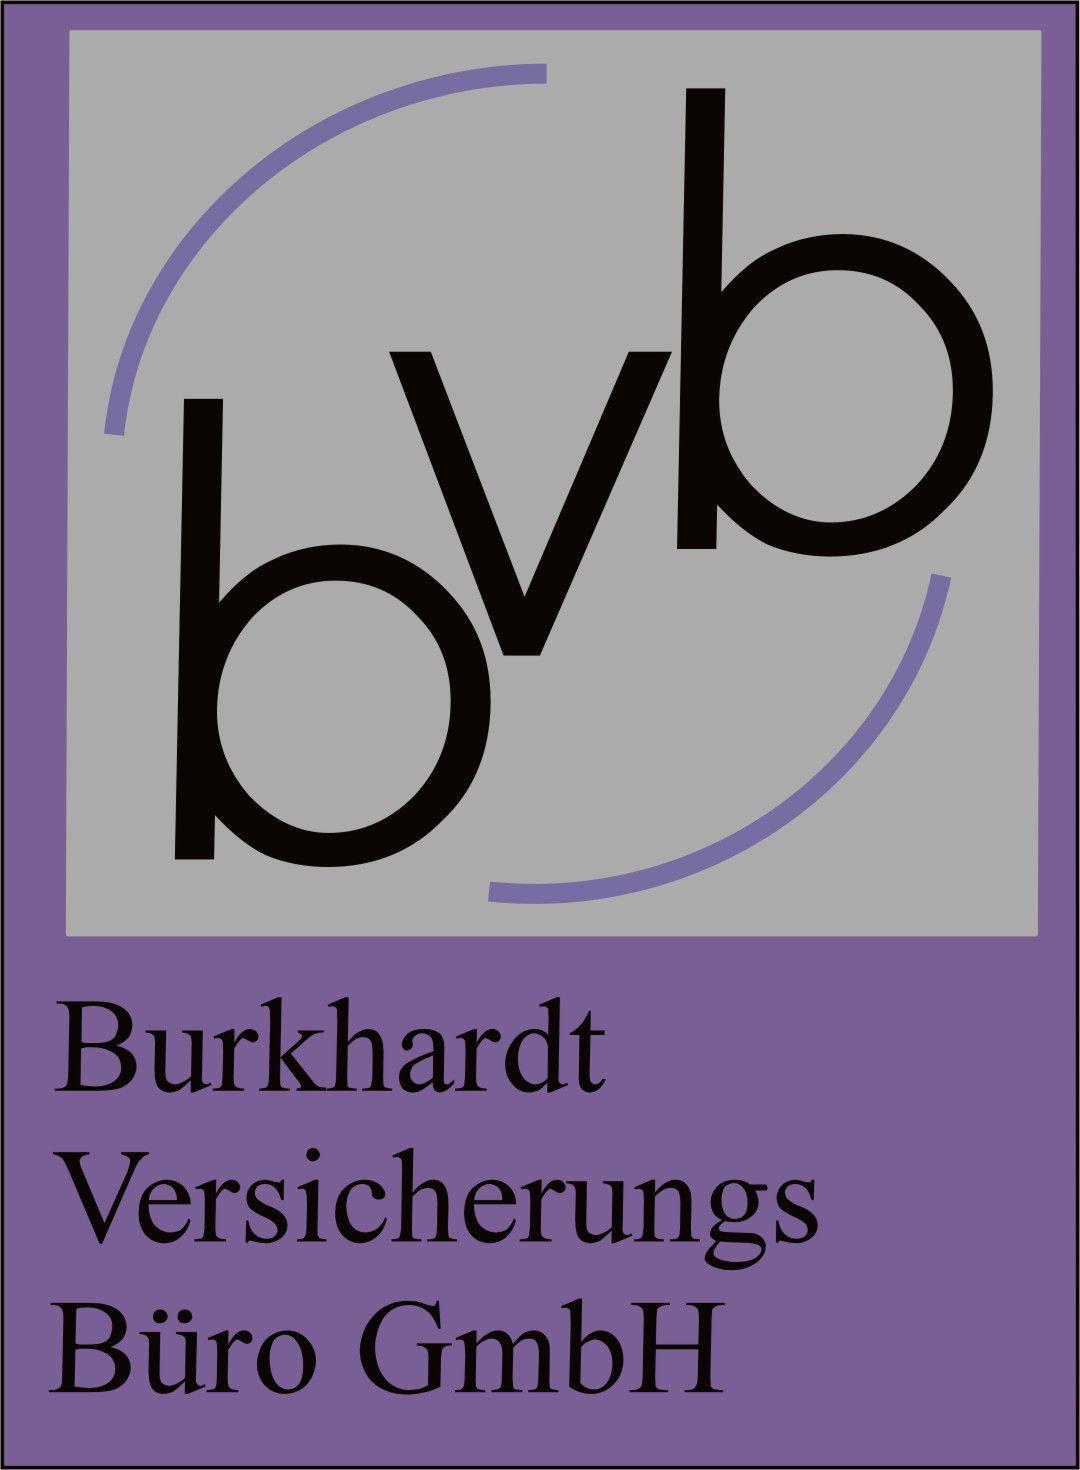 bvb-Burkhardt Versicherungsbuero